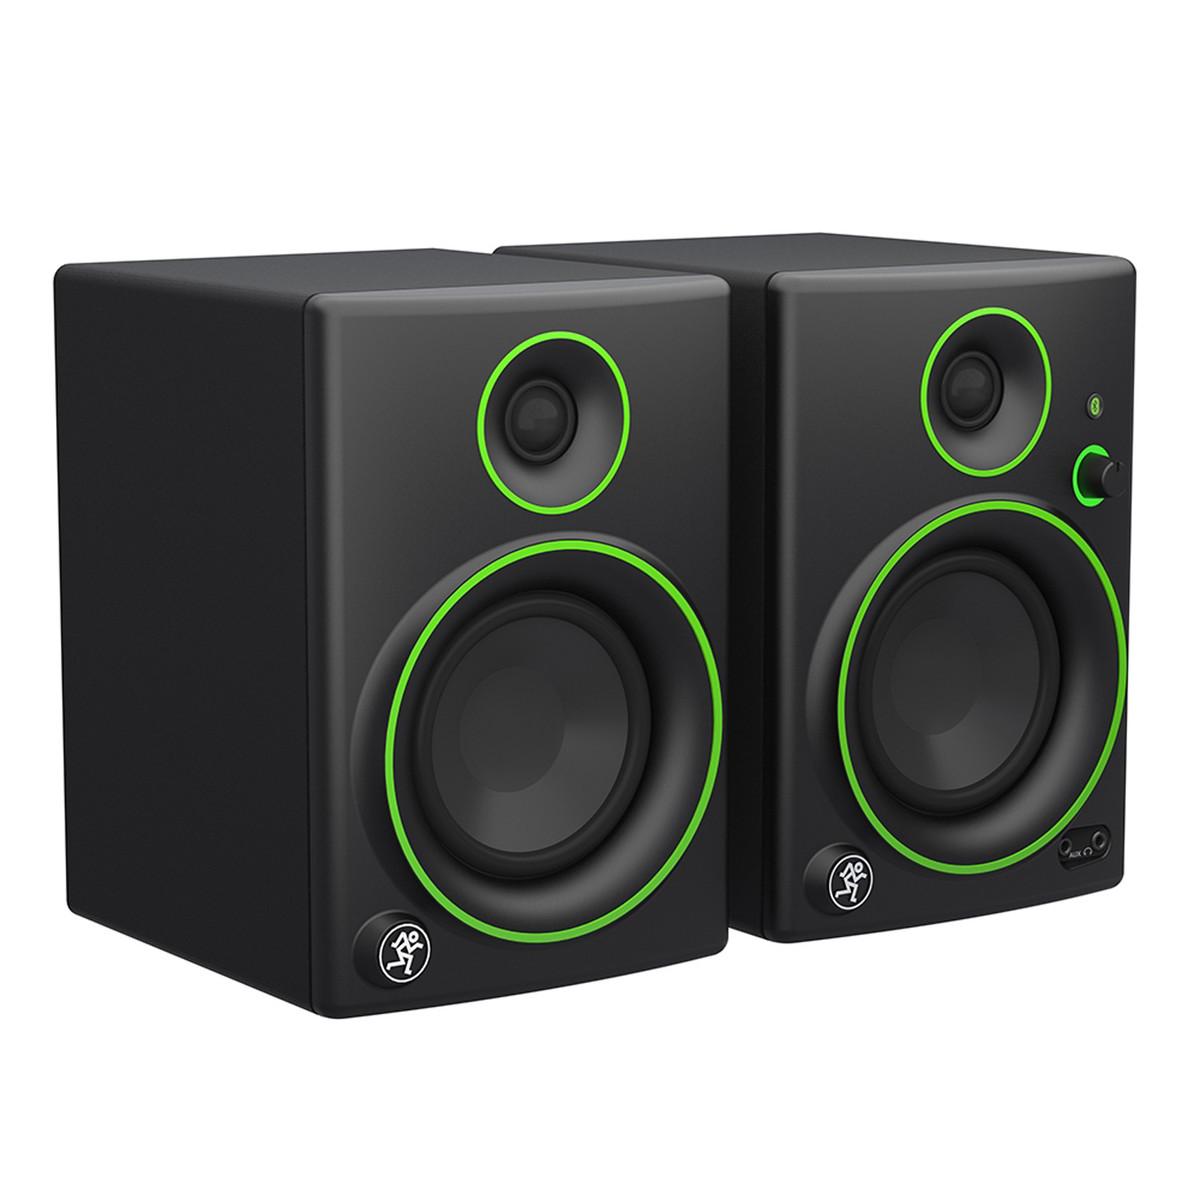 mackie cr4 bt bluetooth monitor speaker pair b stock at gear4music. Black Bedroom Furniture Sets. Home Design Ideas